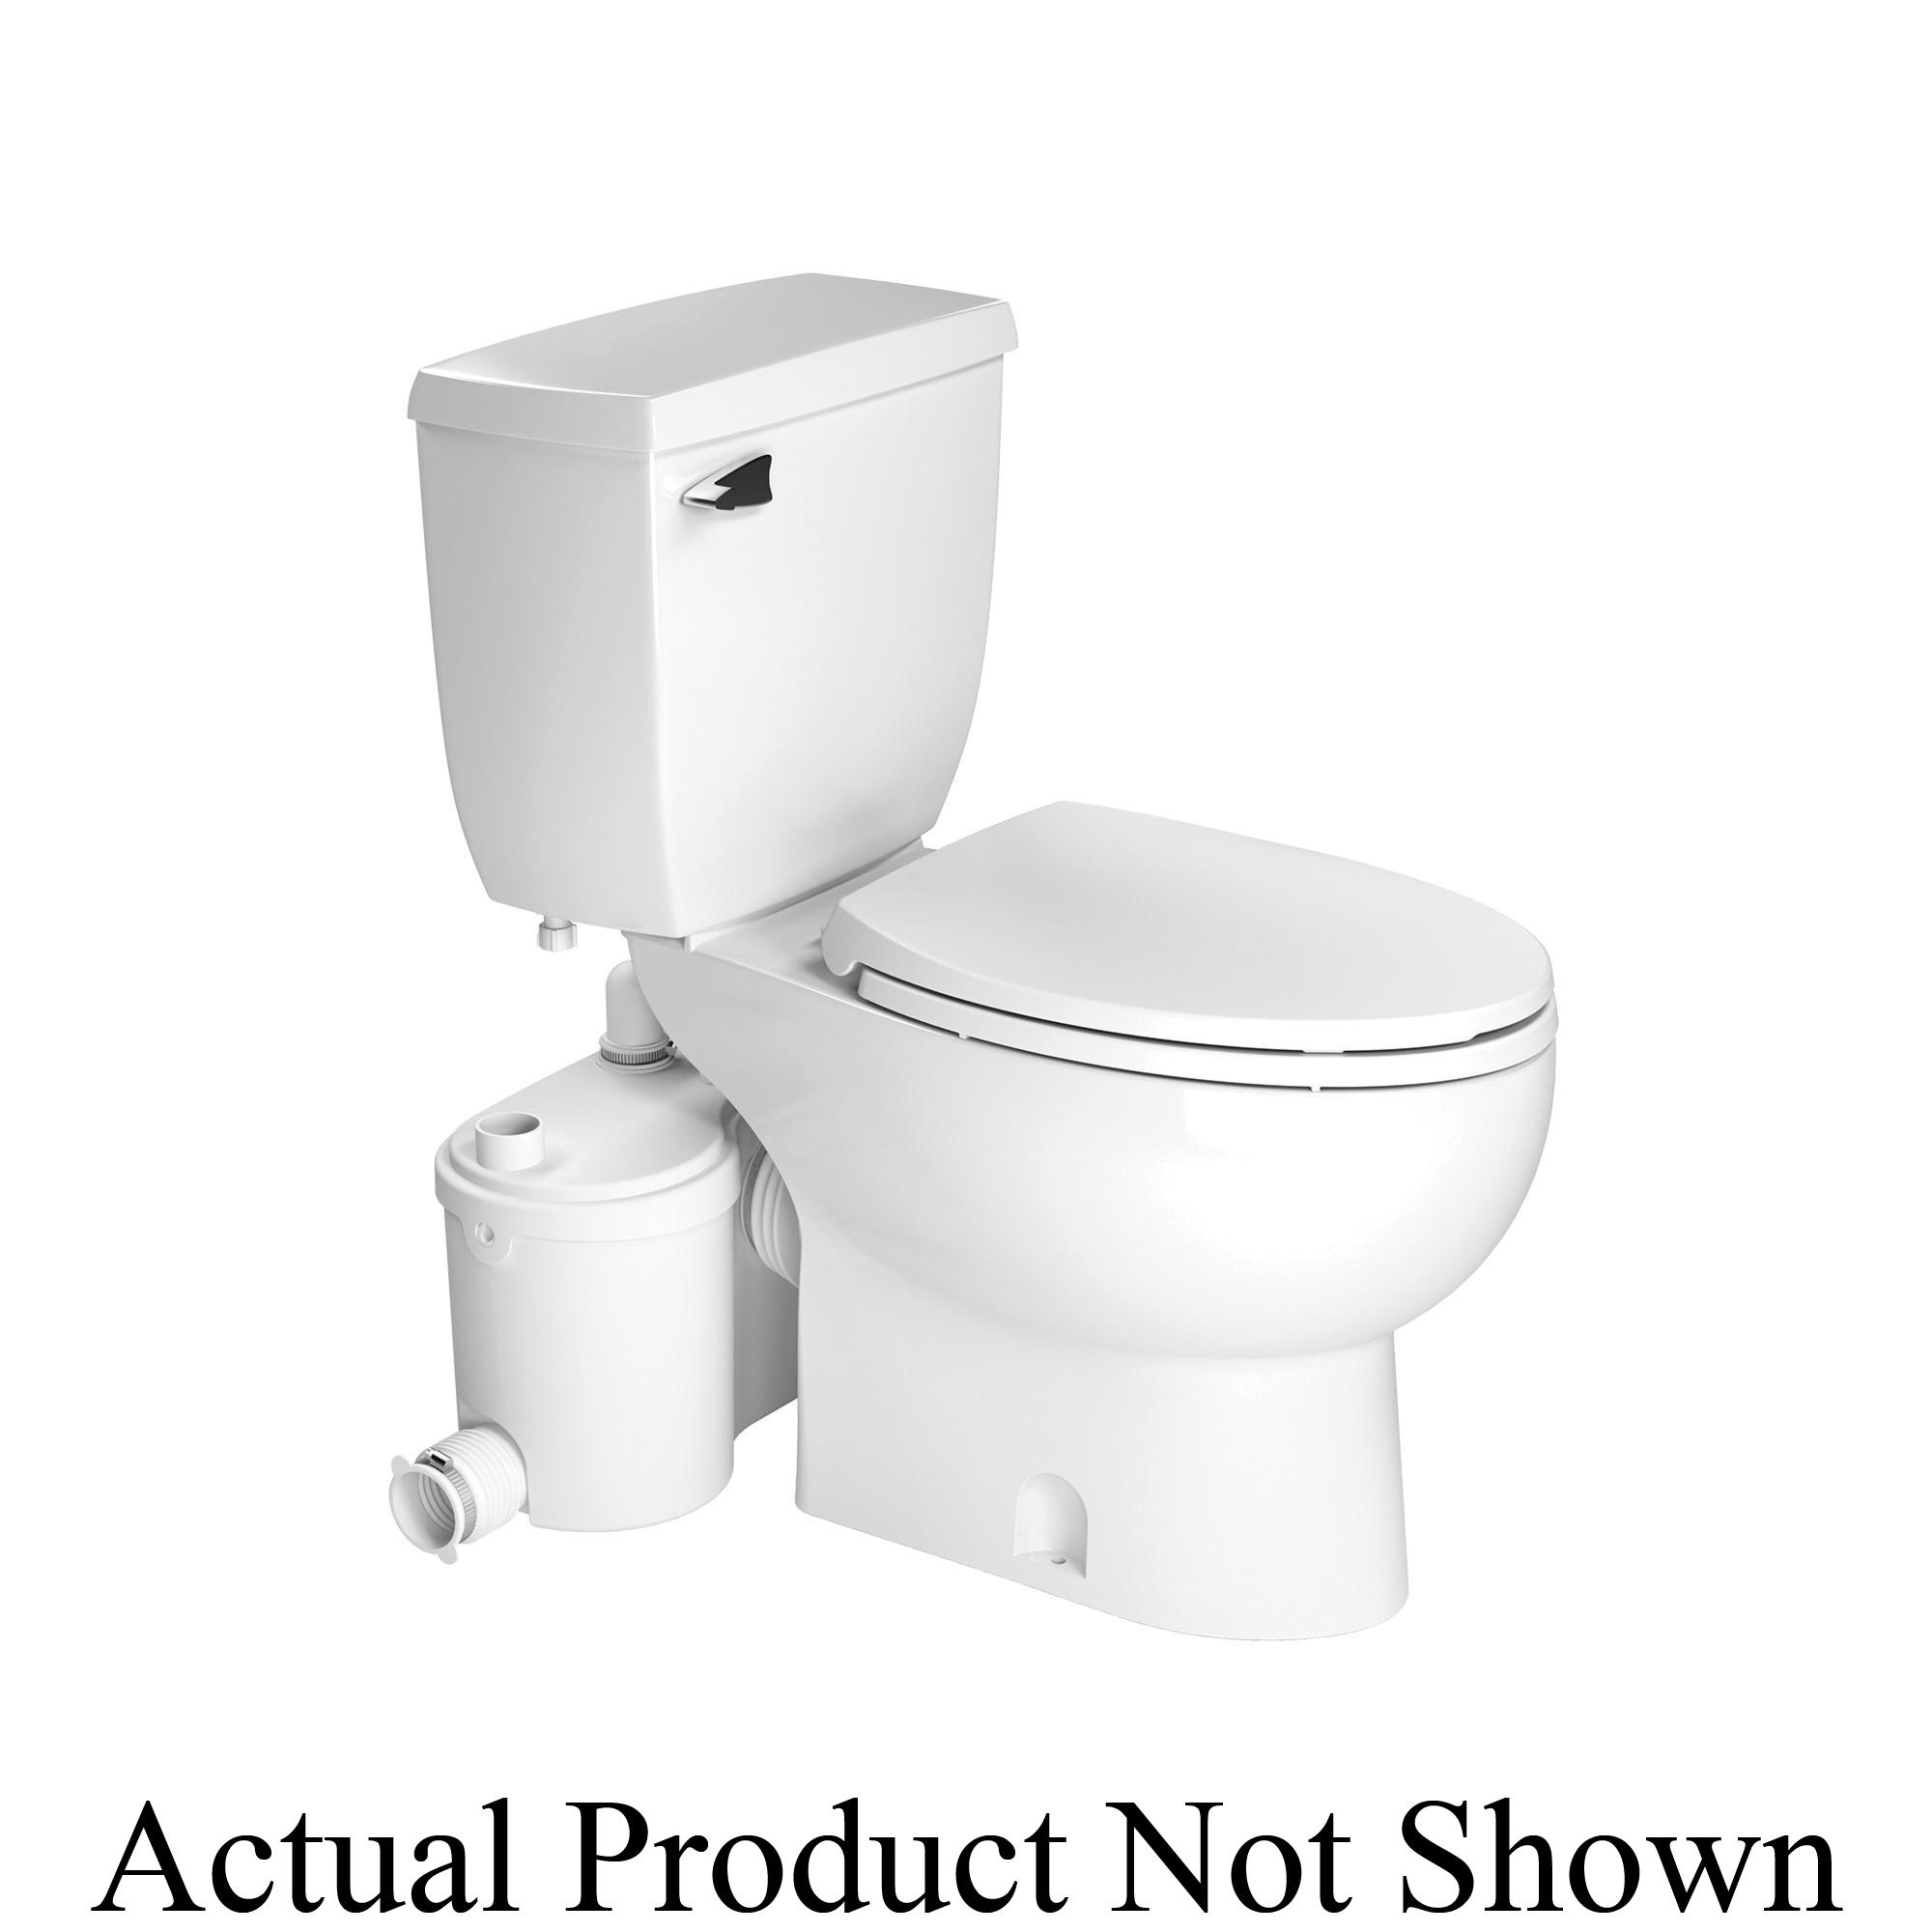 Saniflo® Saniflush® 007 Toilet Bowl, White, Elongated, 3 in Trapway